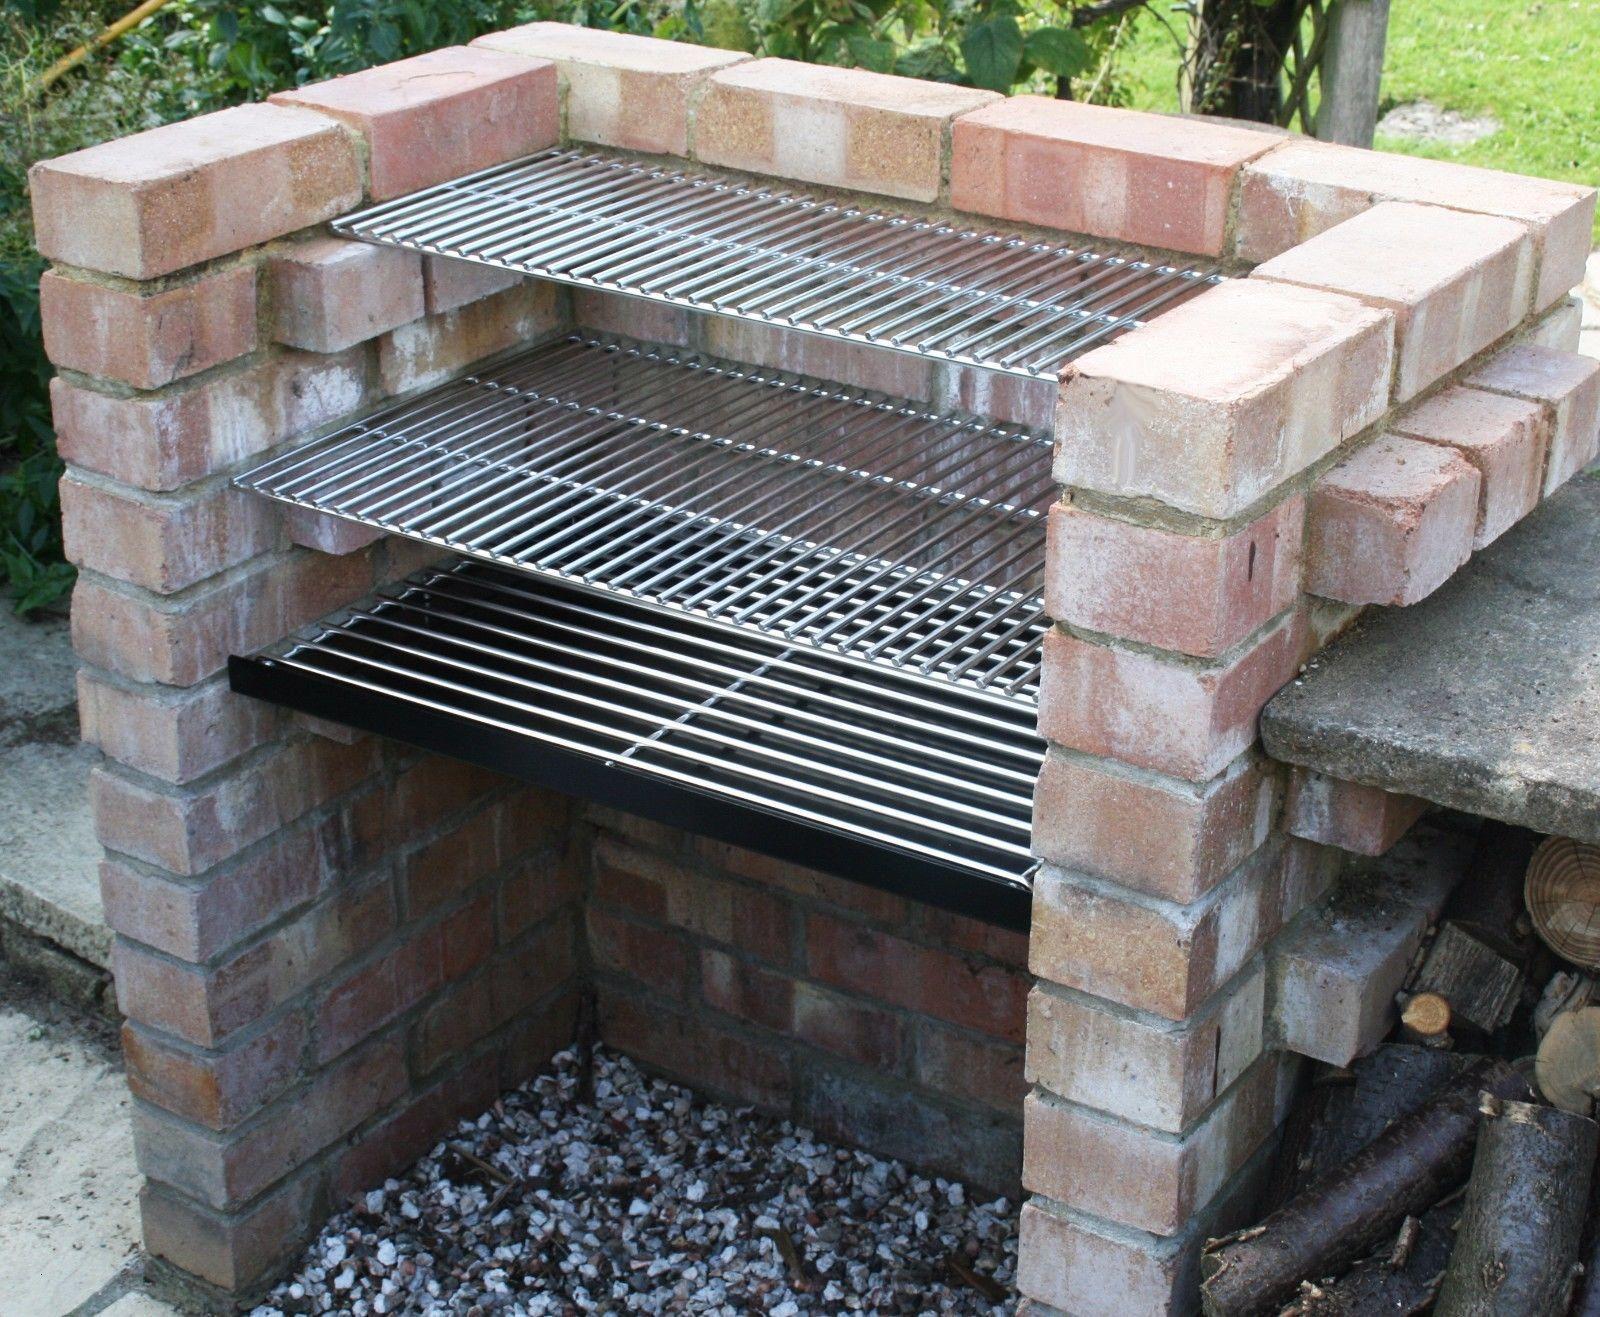 Outdoor Kitchen Bbq Kits Beautiful Charcoal Diy Brick Bbq Kit With